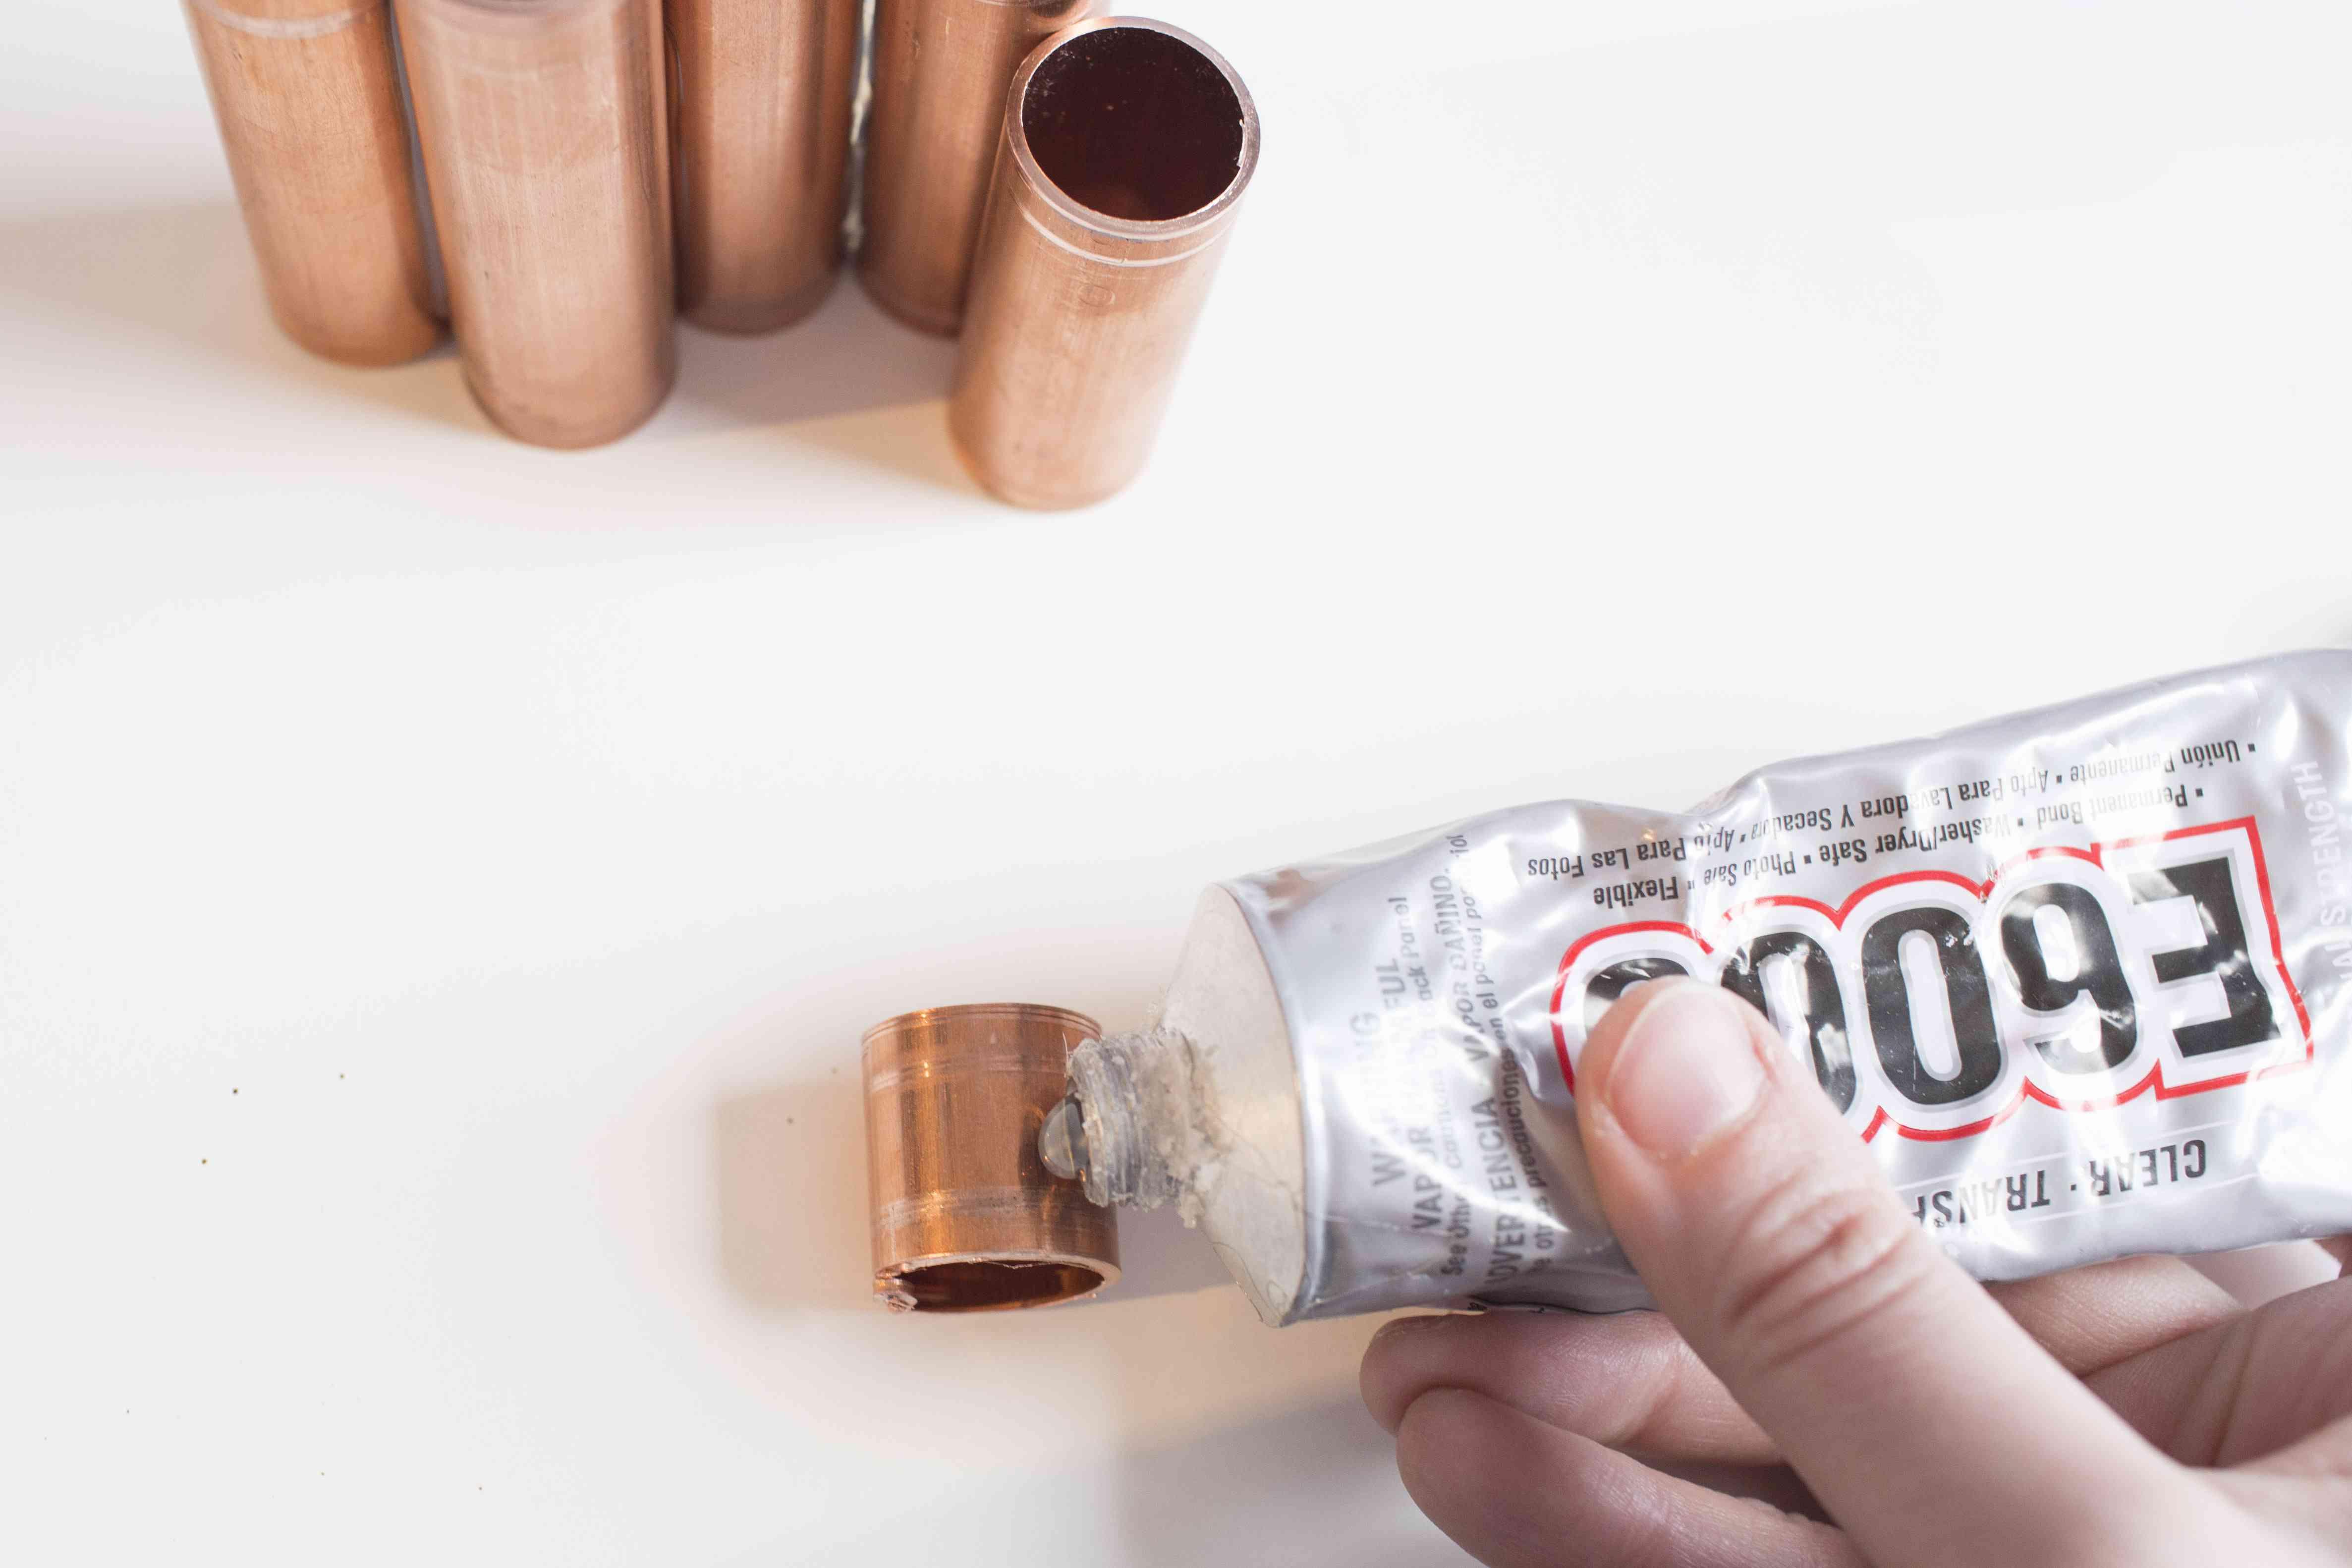 Using E6000 glue on the copper pipe pieces